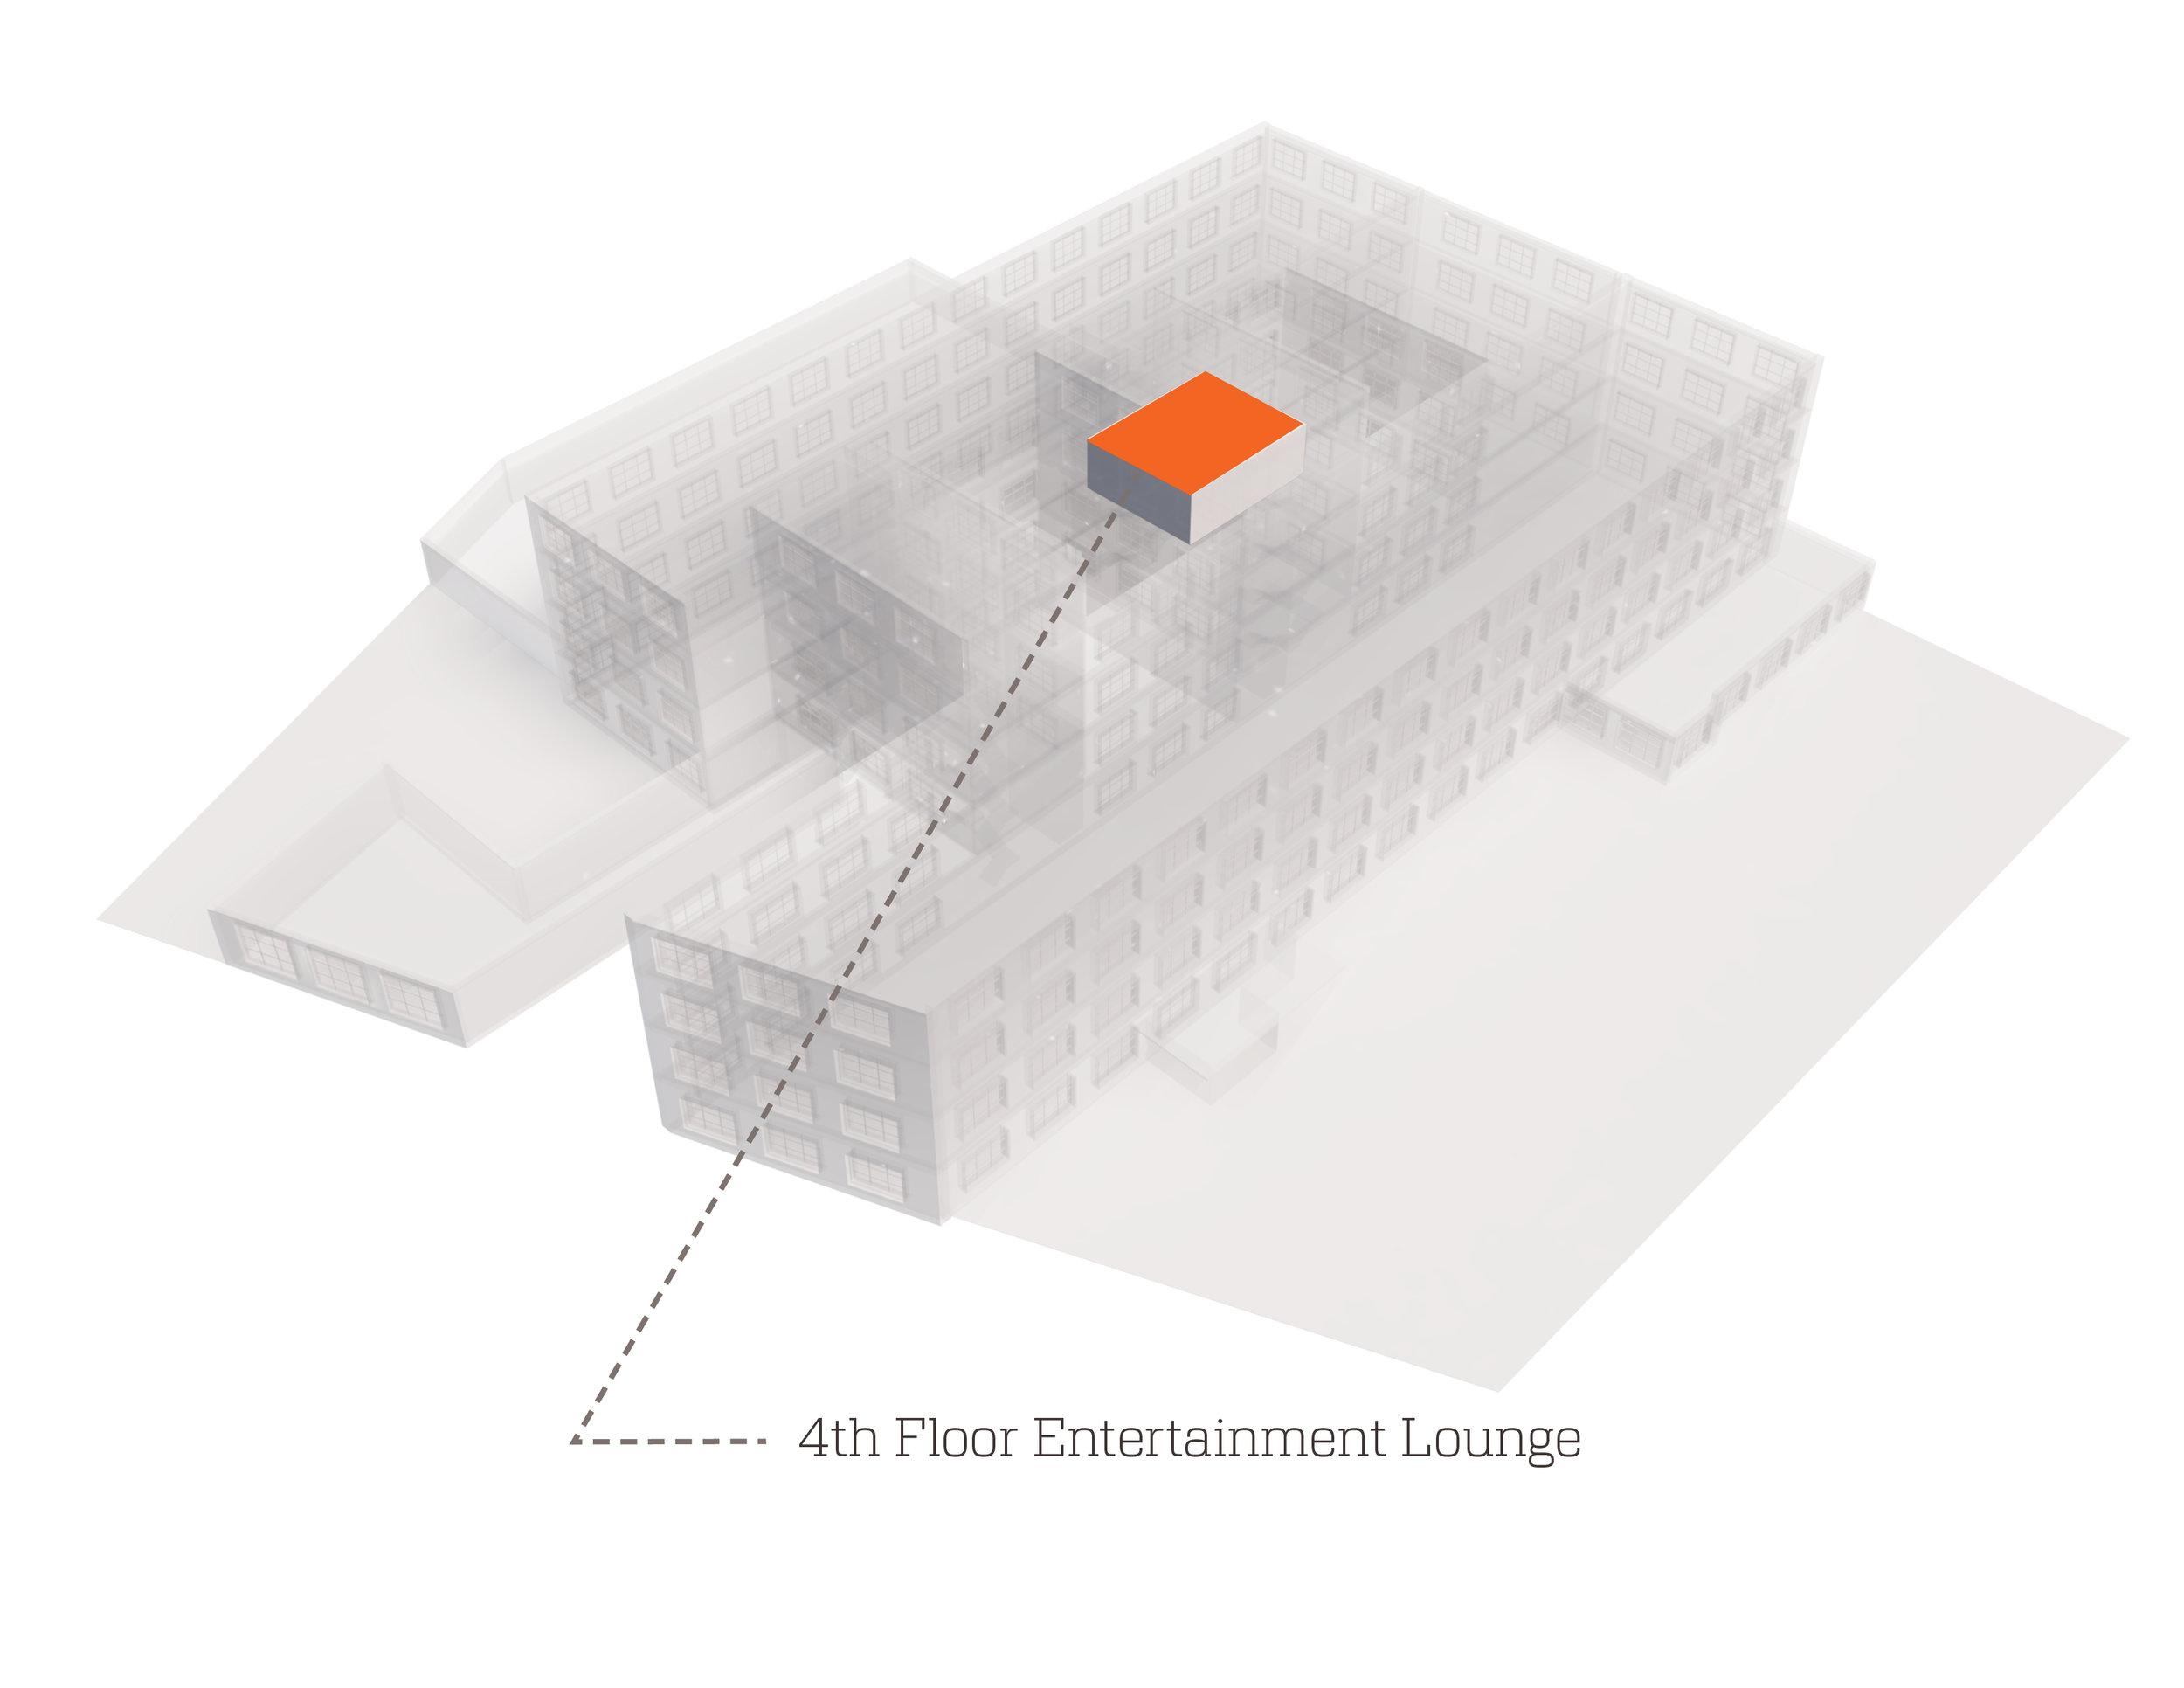 amenities diagrams10.jpg